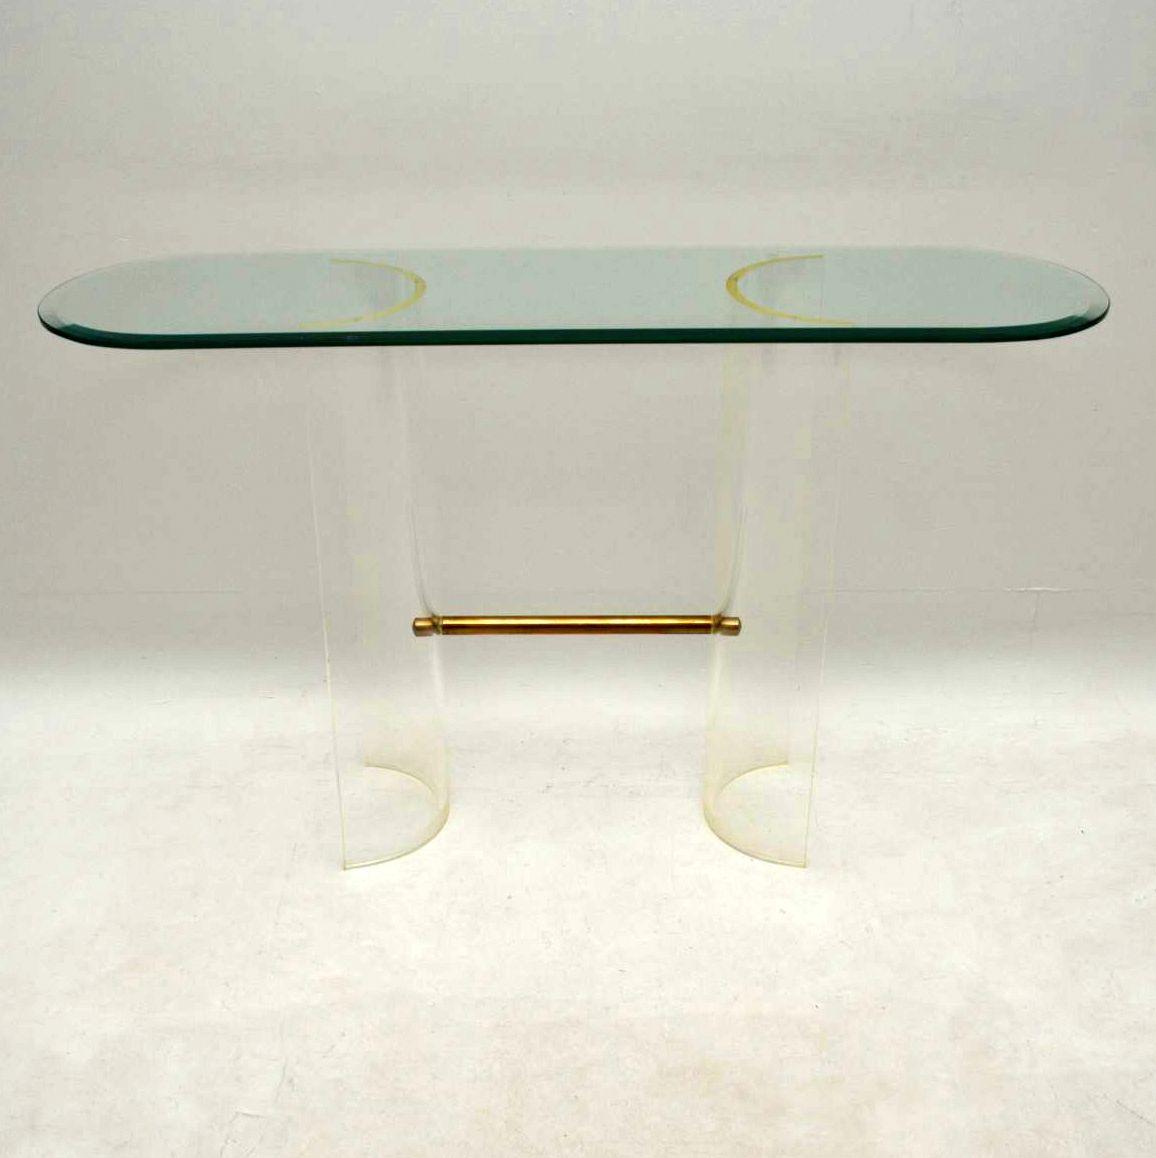 1970 S Vintage Glass Amp Perspex Console Table Retrospective Interiors Vintage